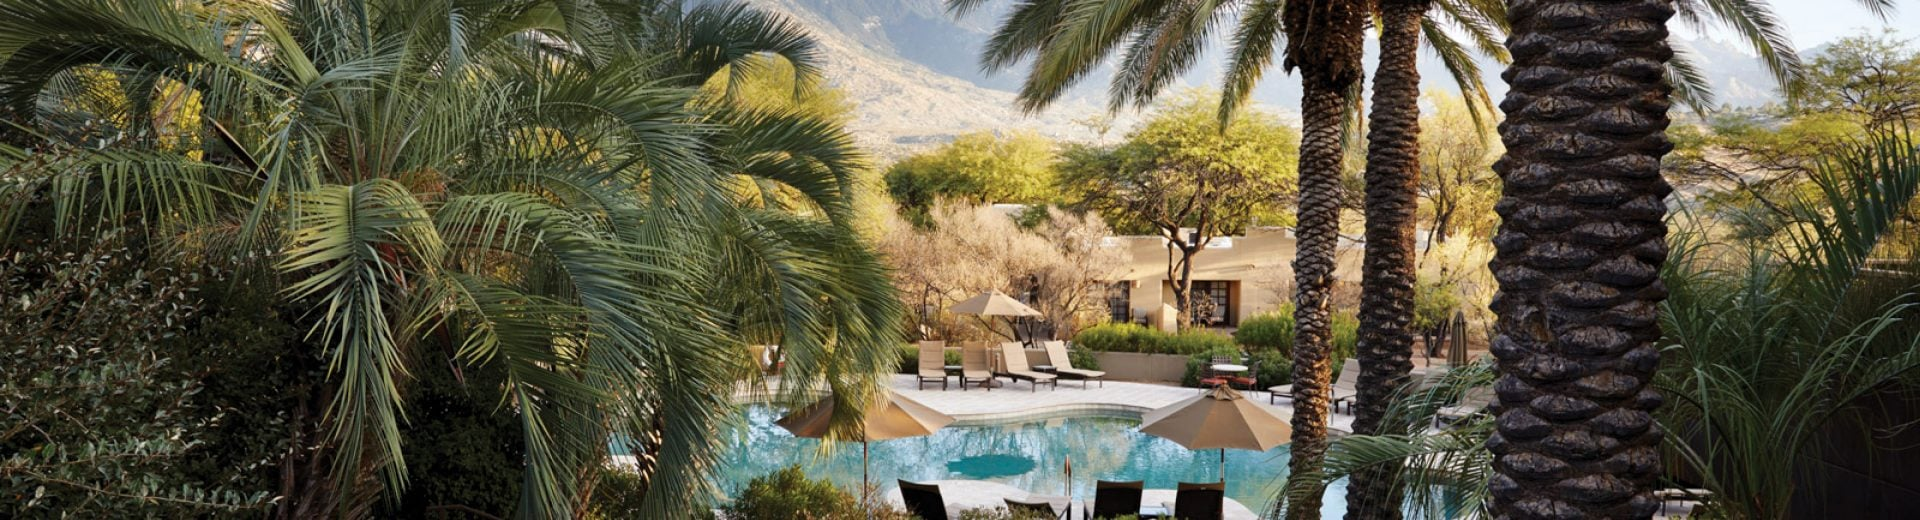 Miraval Arizona Pool view